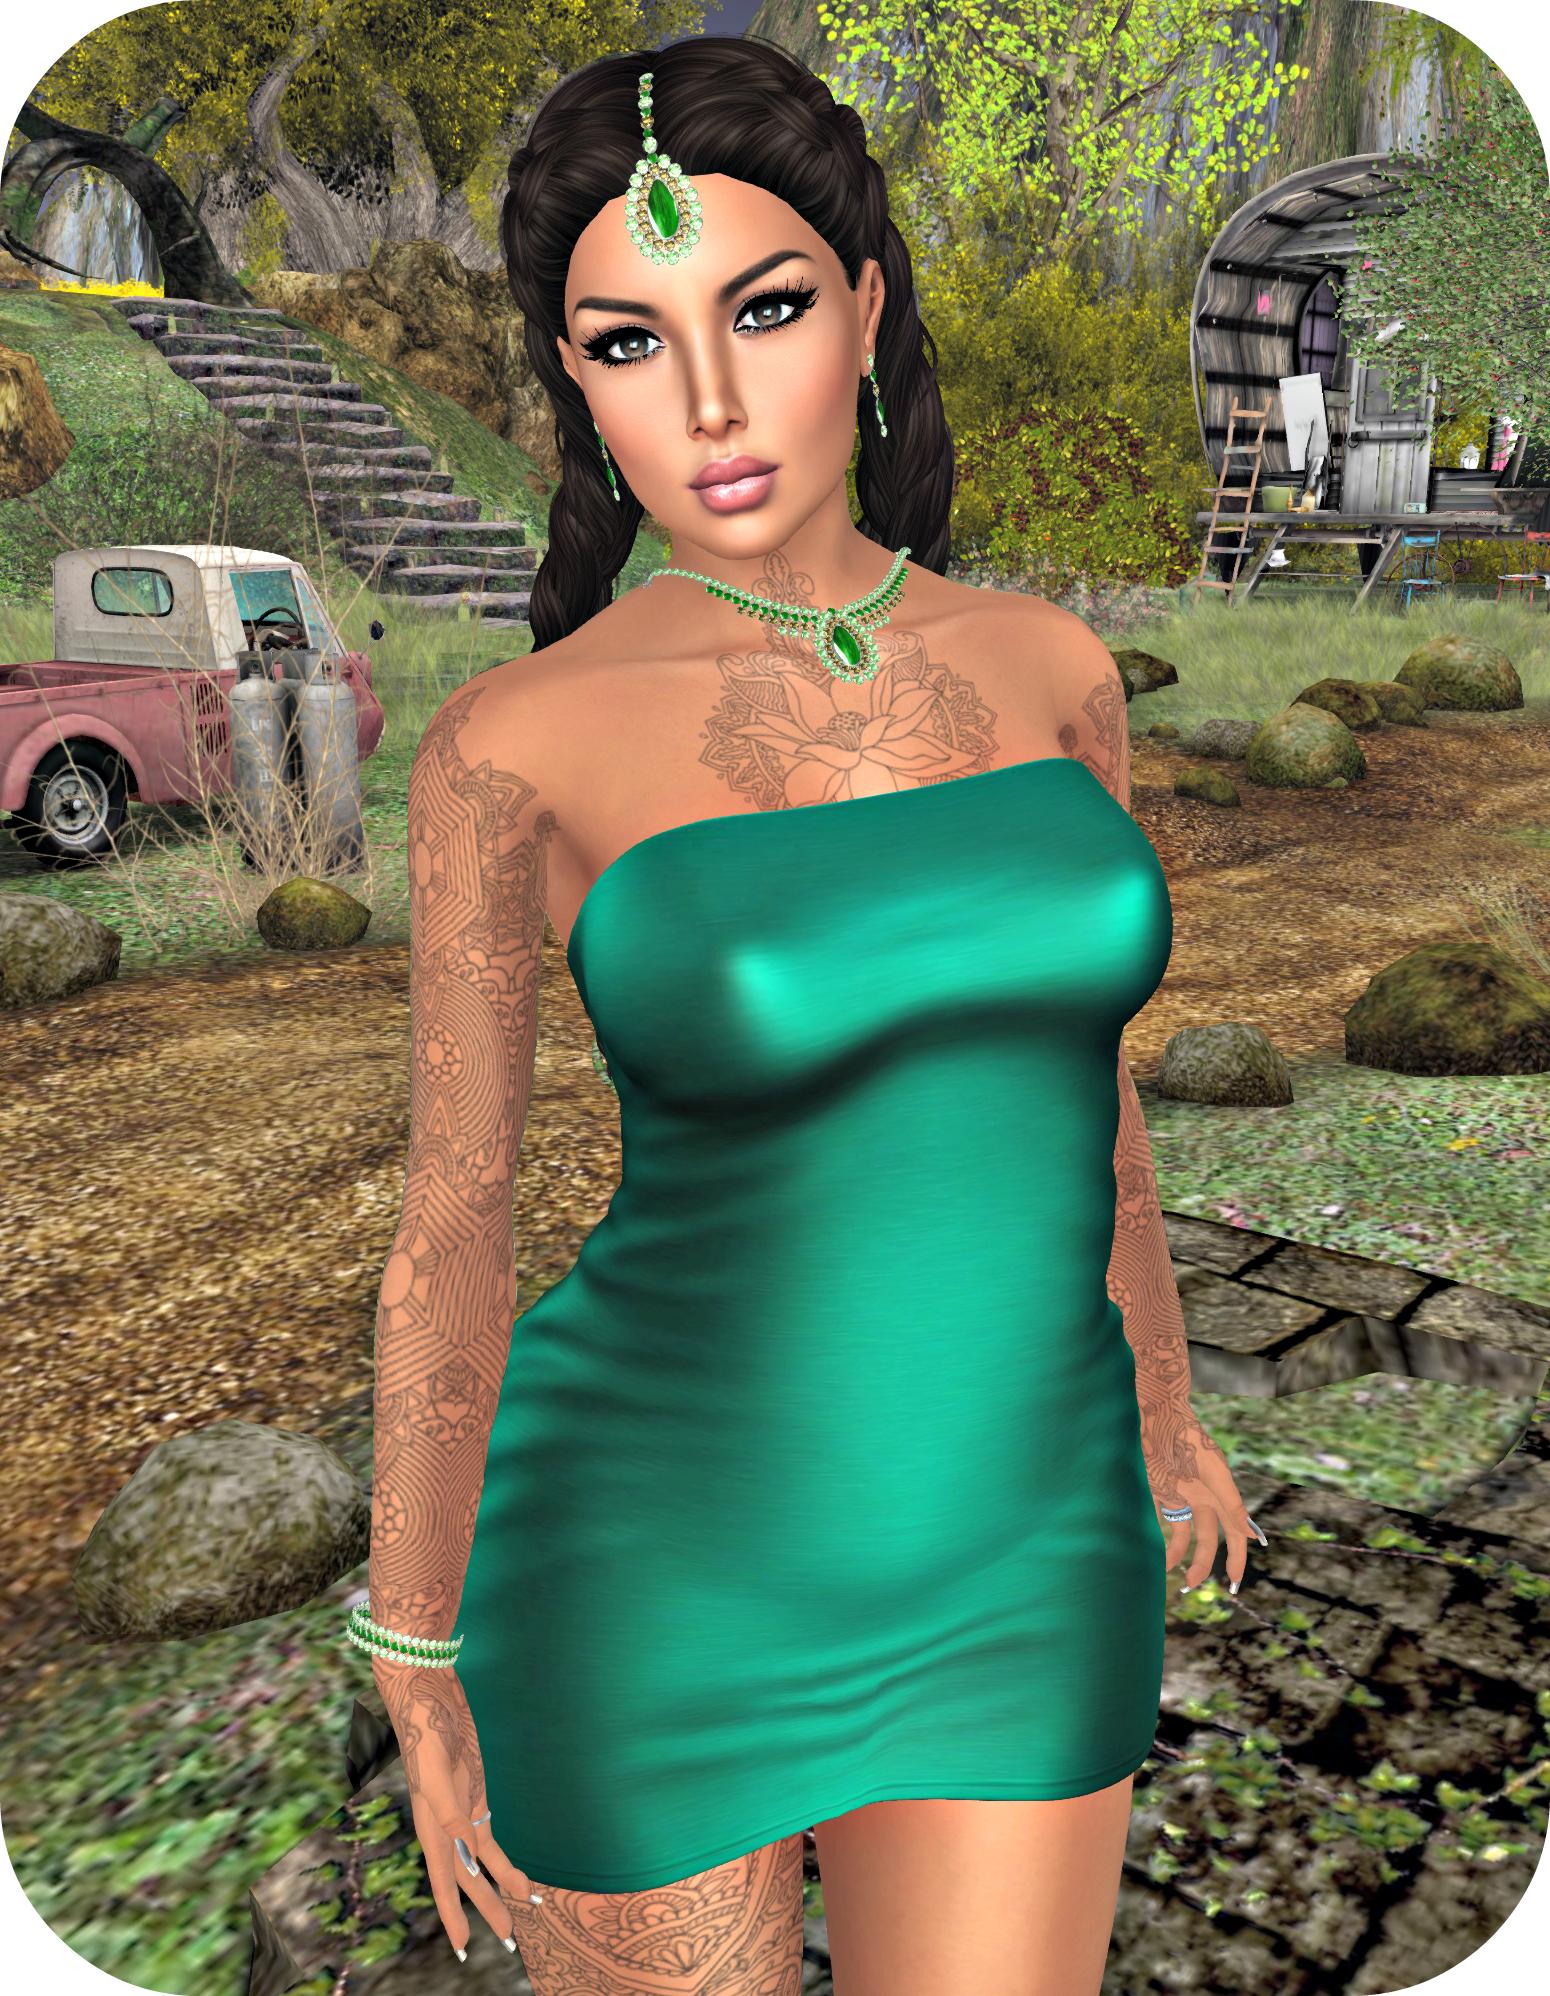 sept-20th-blog-post-photo-exposeur-alisha_cropped